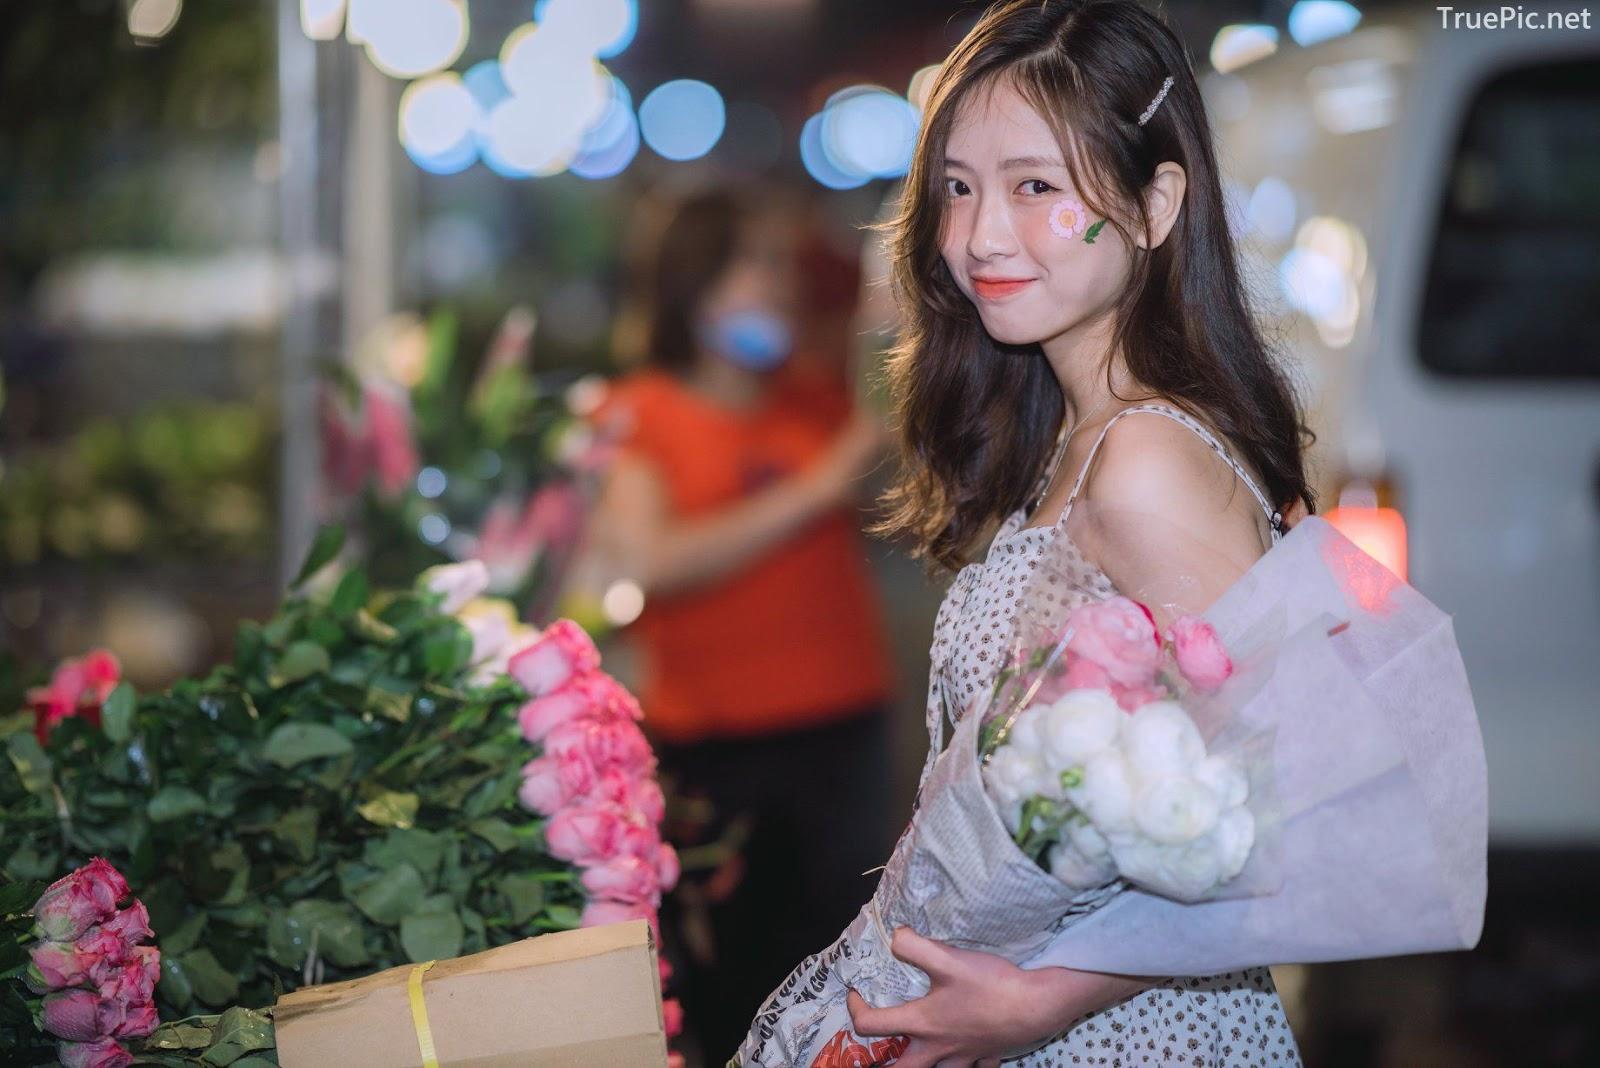 Vietnamese Hot Girl Linh Hoai - Strolling on the flower street - TruePic.net - Picture 8